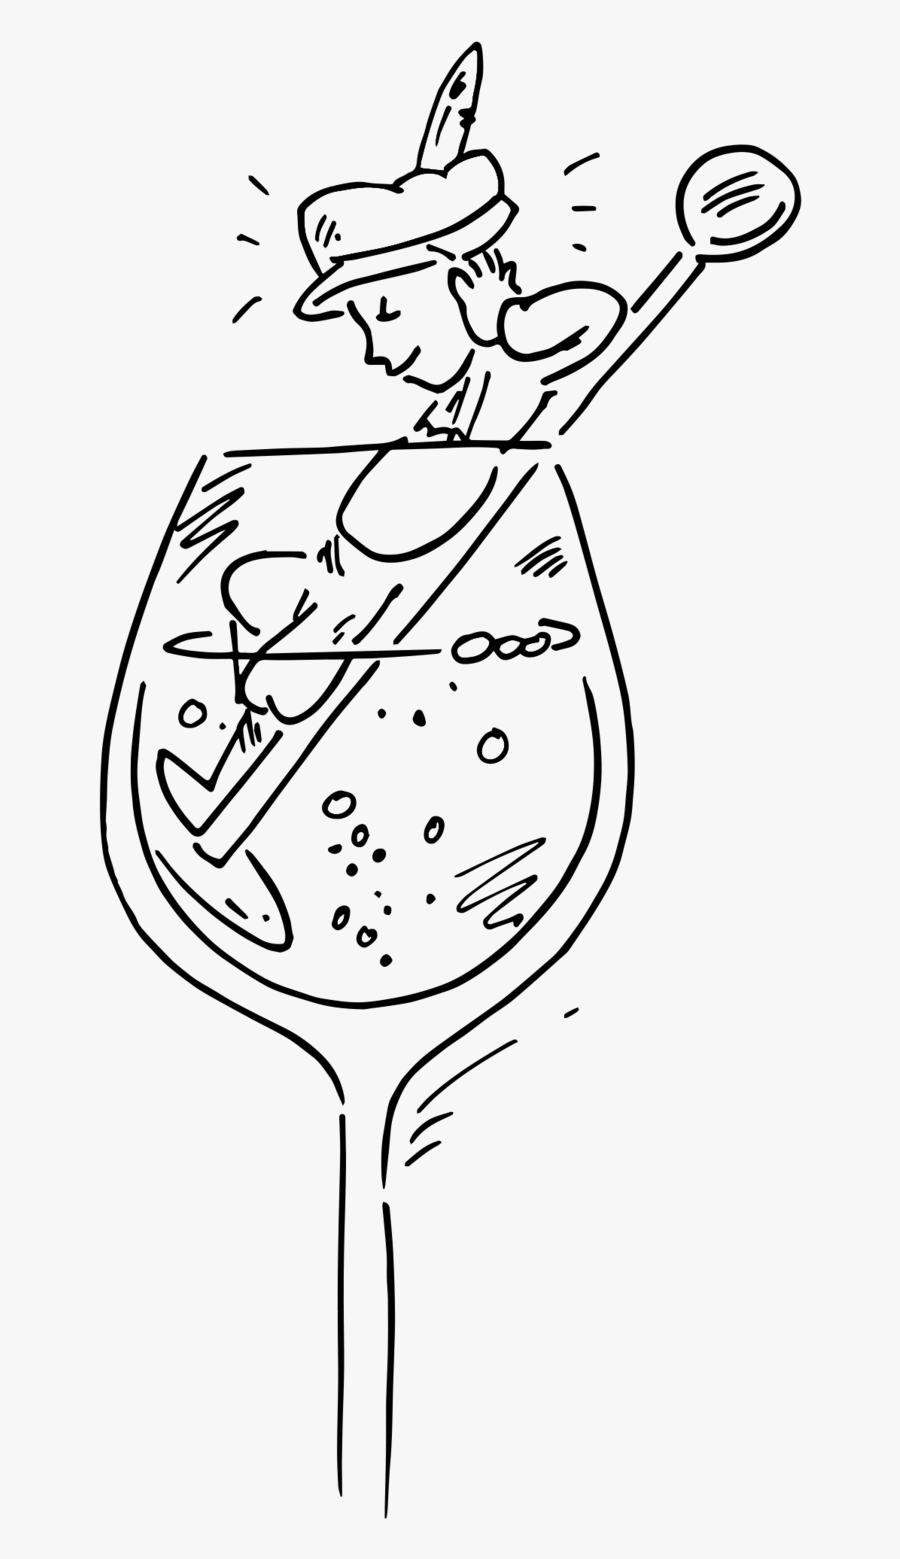 Rainbow Art Menu Vertebrate Illustration Secret Starbucks - Line Art, Transparent Clipart